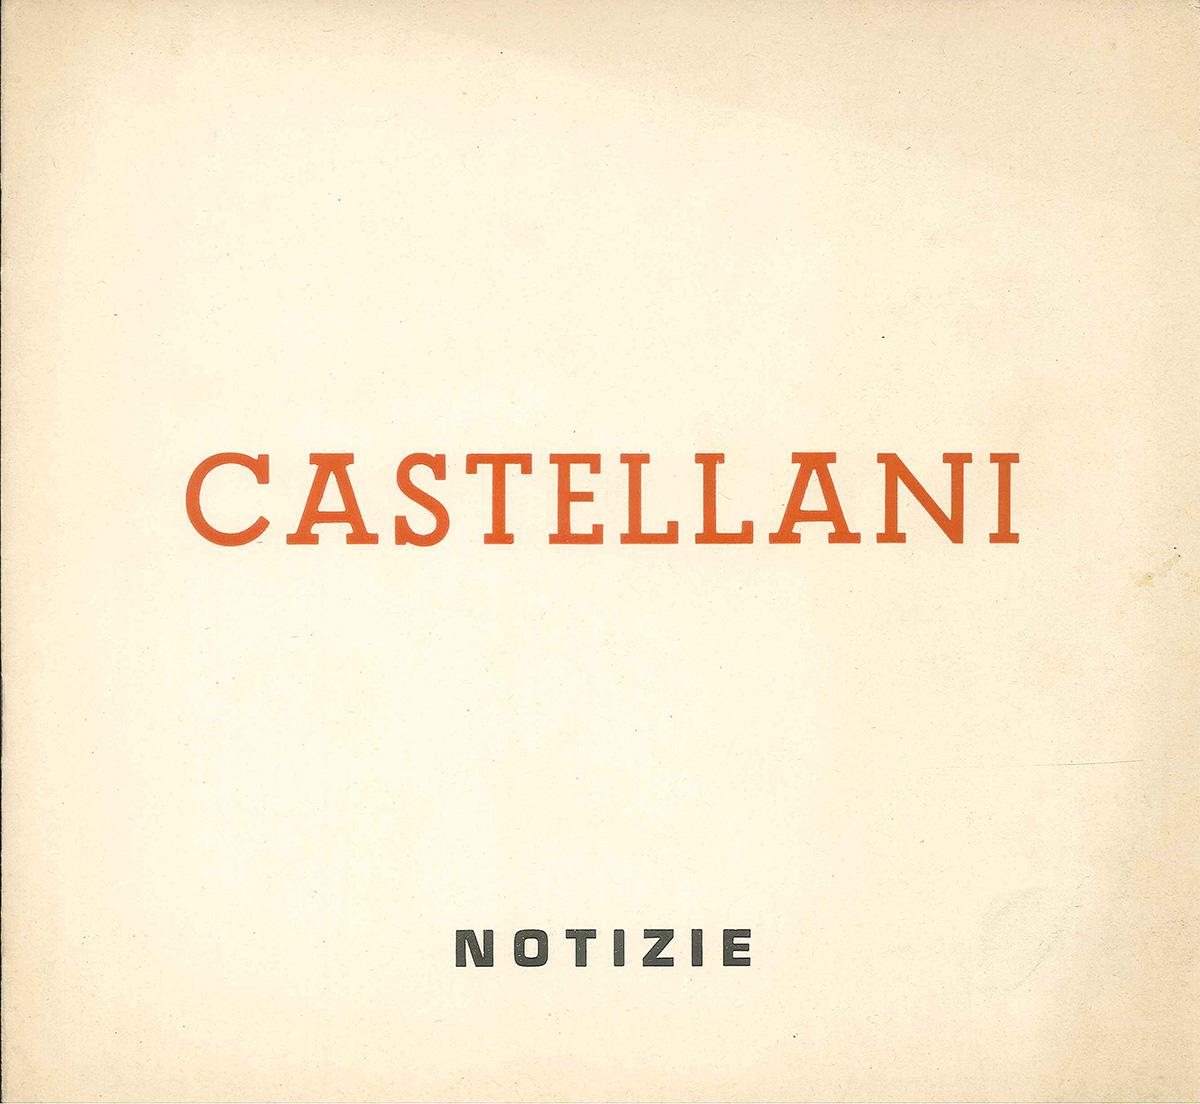 Copertina - Castellani, Carla Lonzi, 1964, Galleria Notizie, Torino